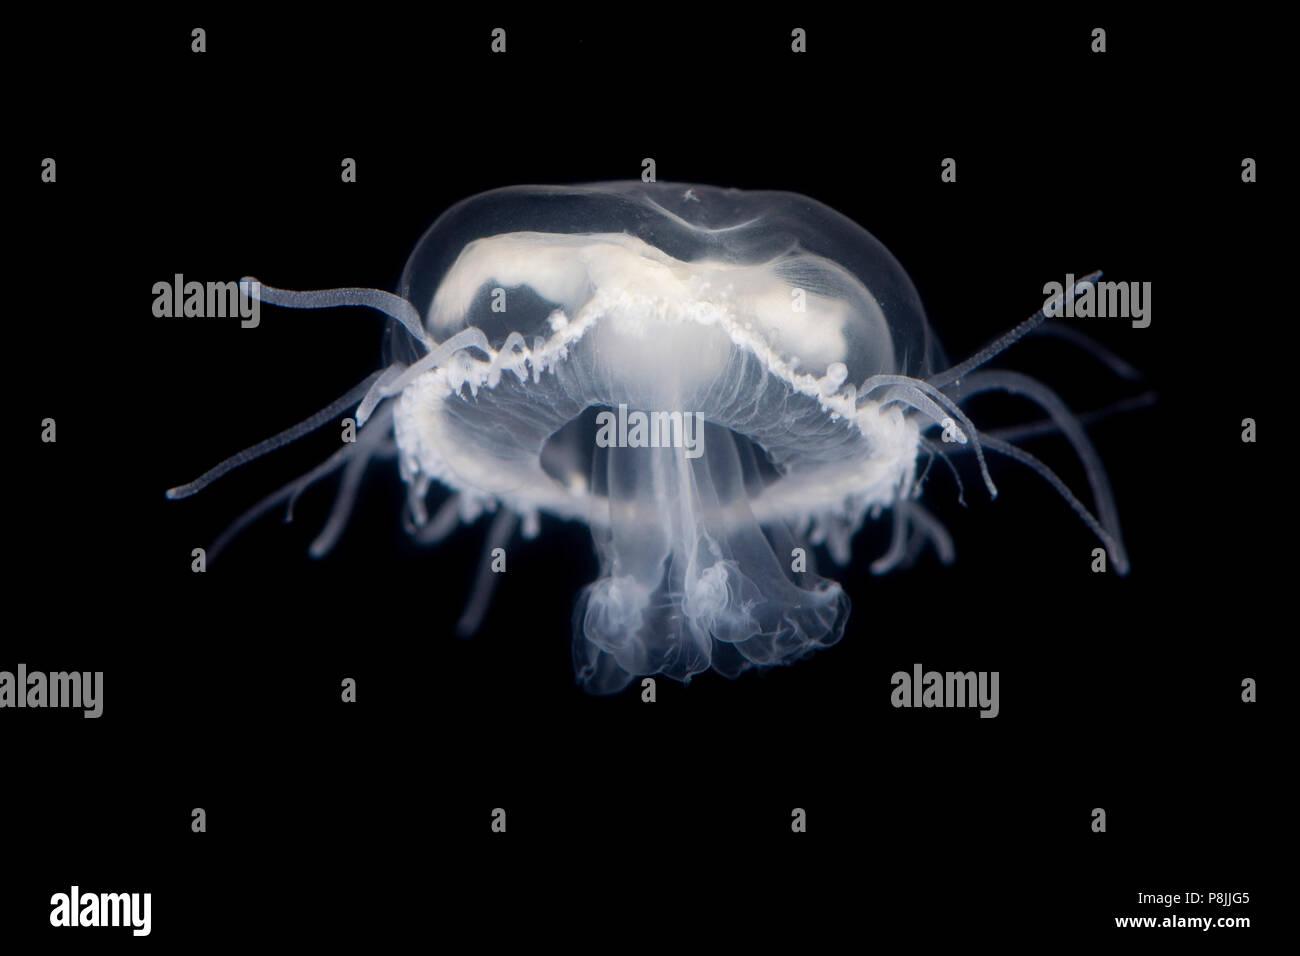 Freshwater jellyfish - Stock Image